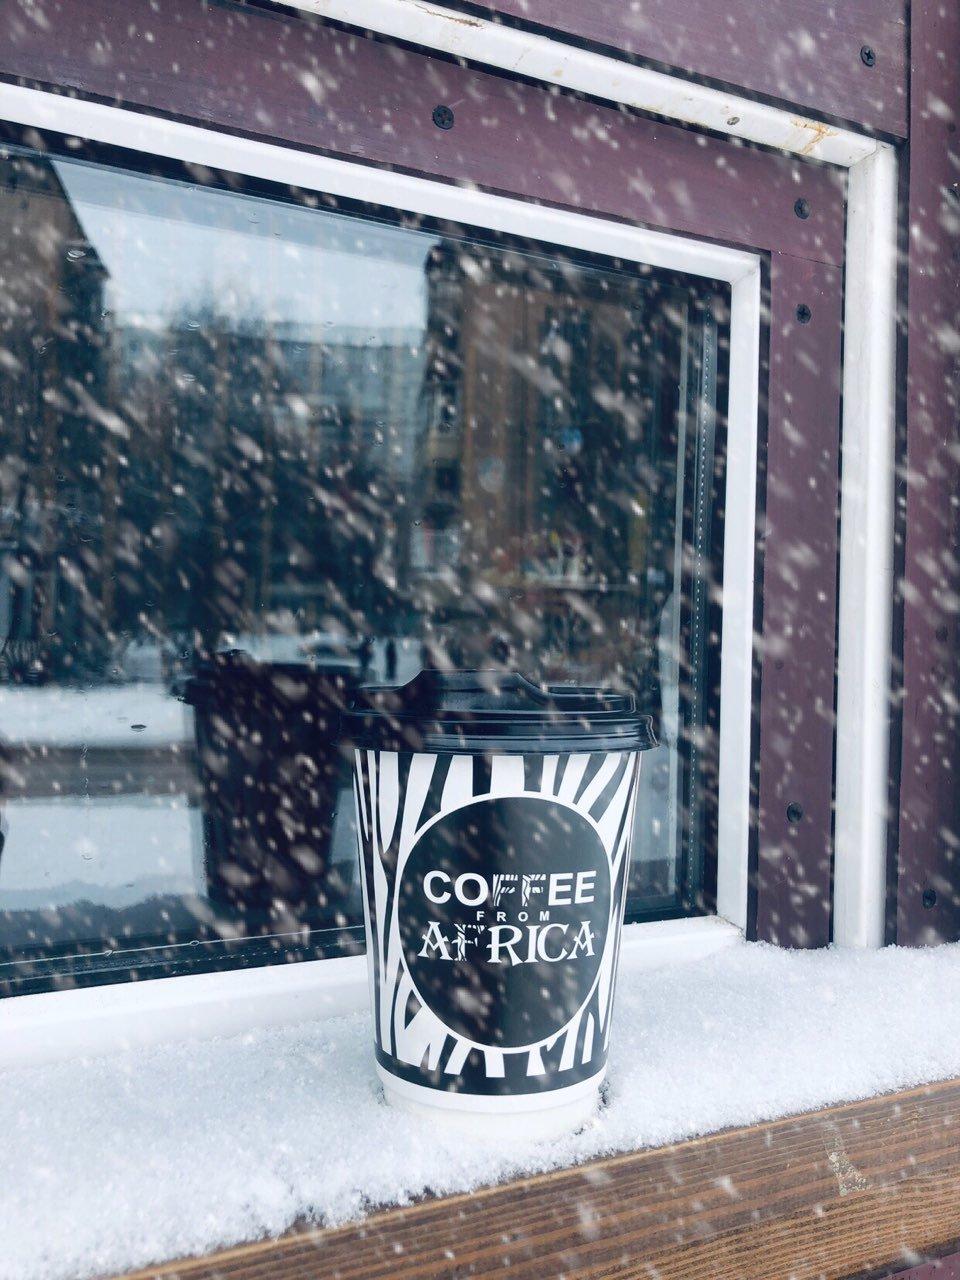 Кохання з присмаком кави: де у Хмельницькому провести День закоханих, фото-10